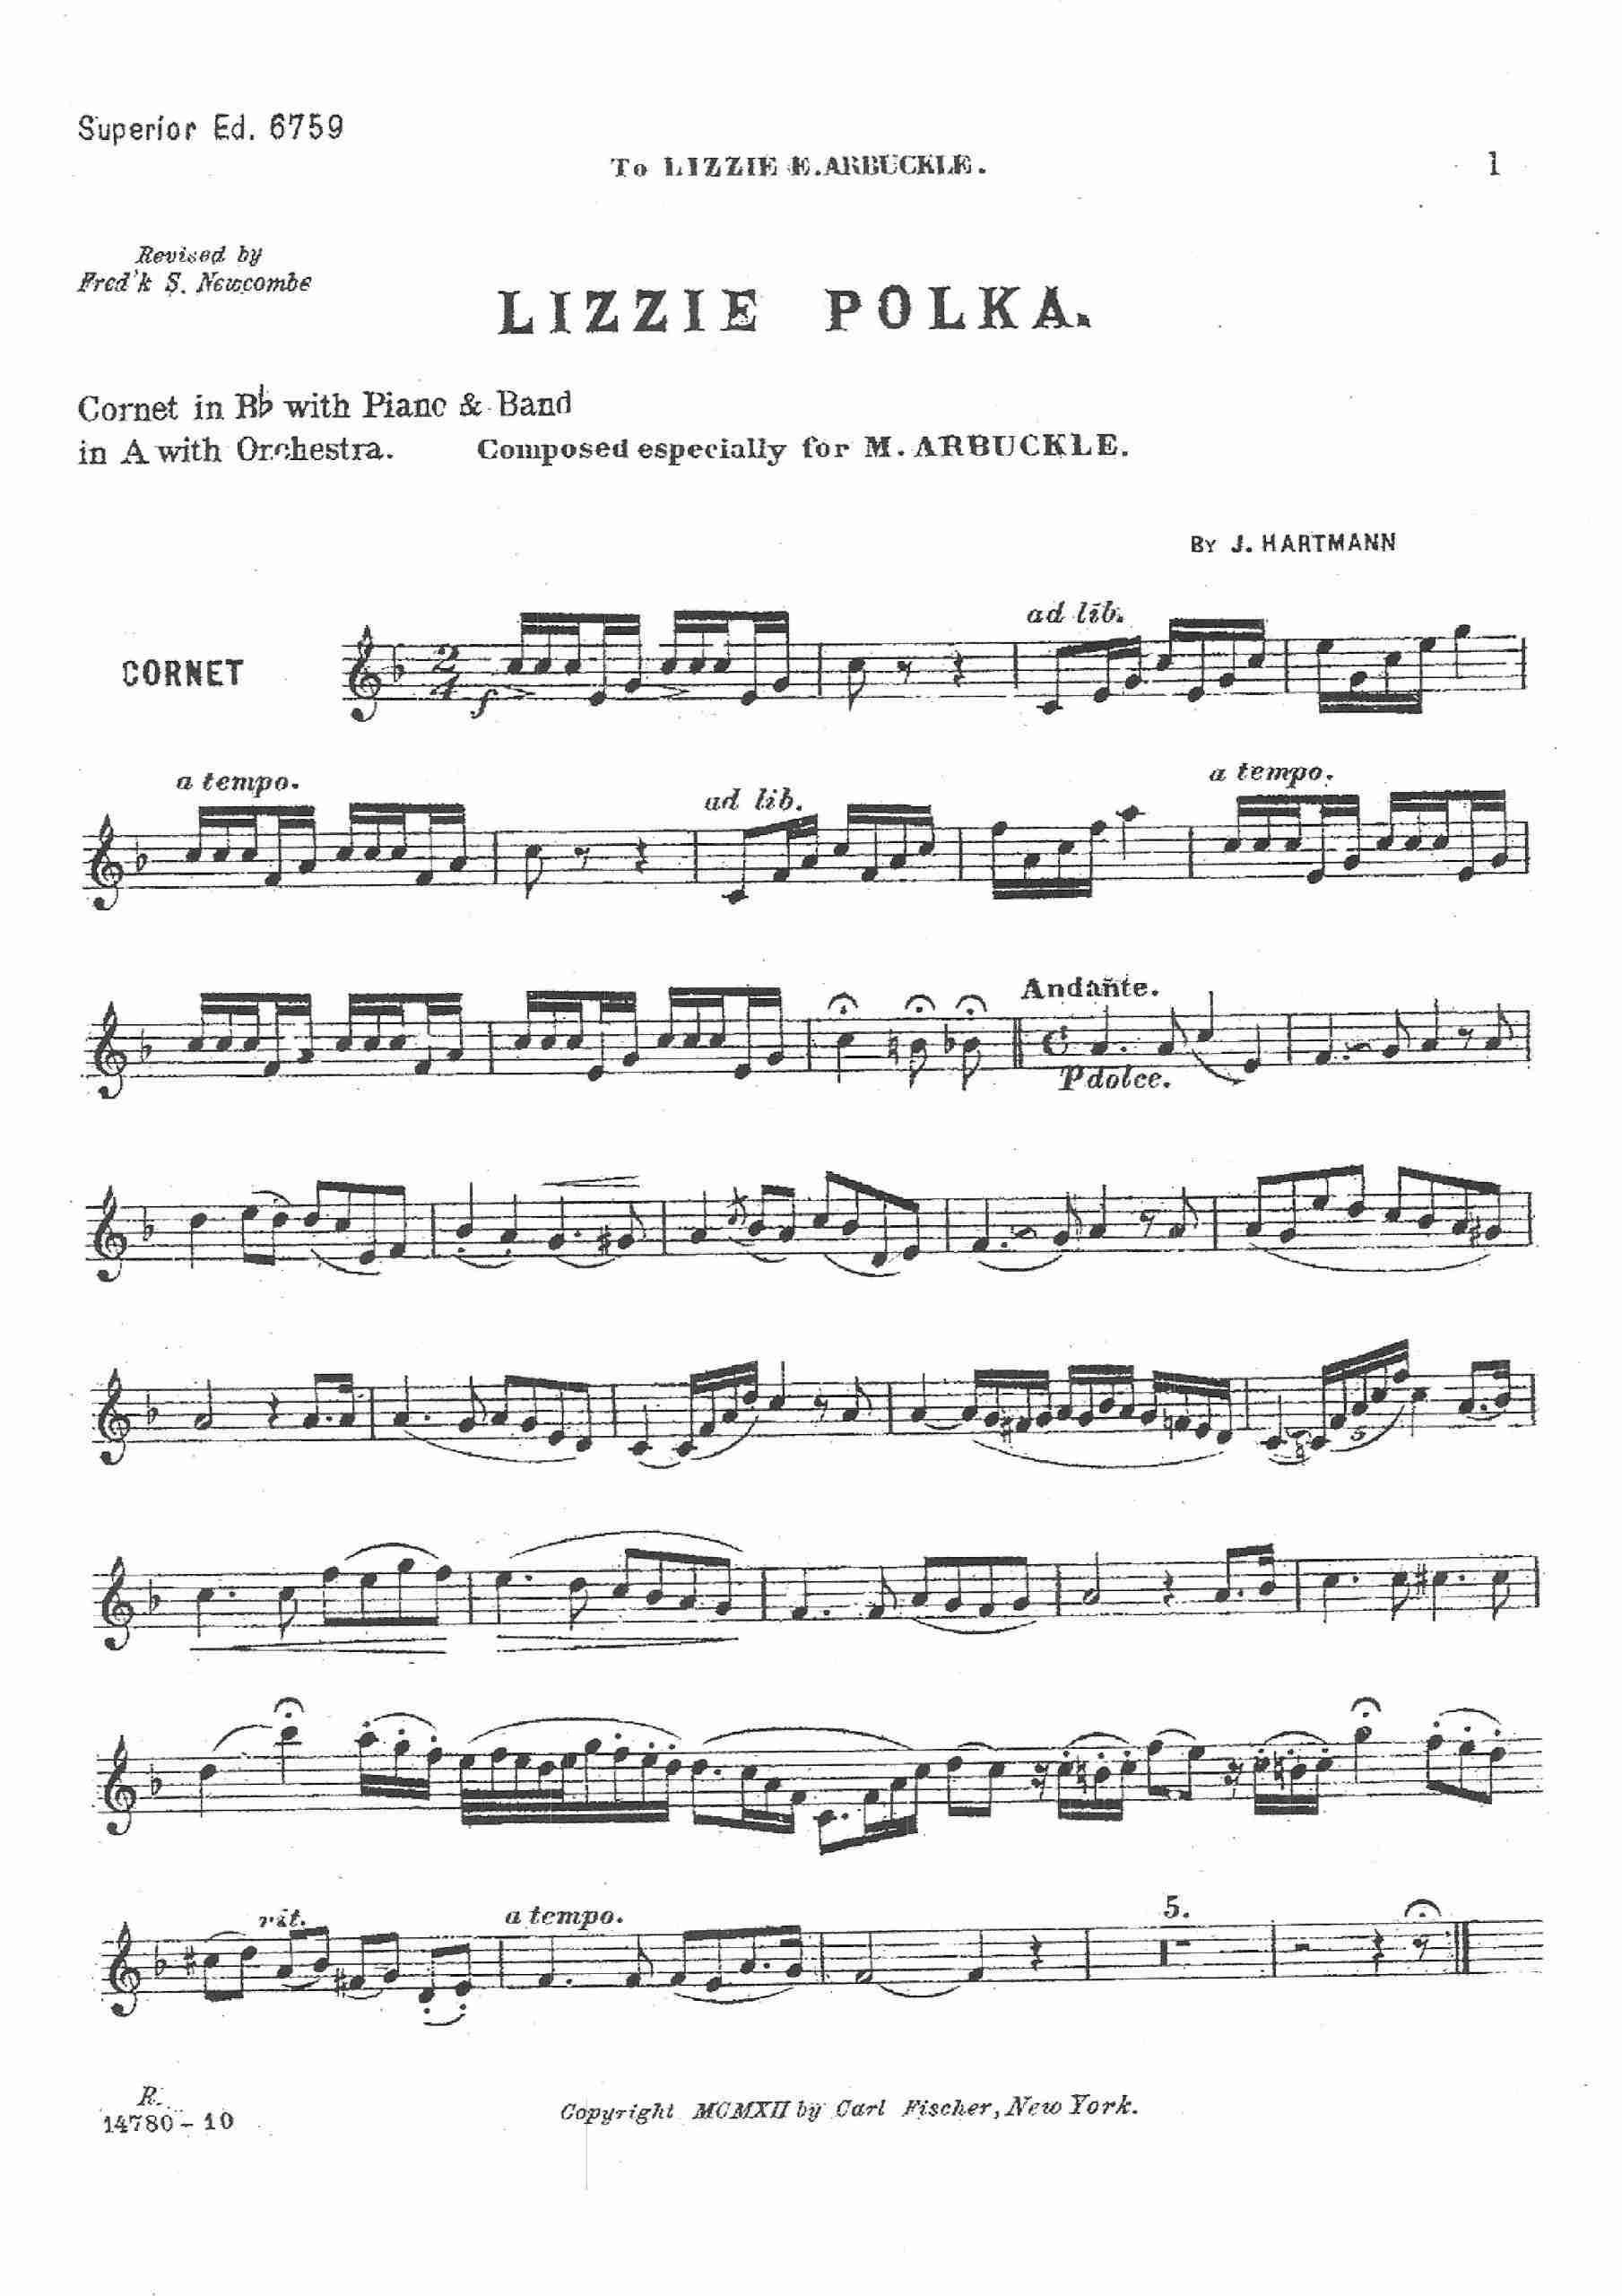 Hartmann, John - Lizzie Polka (cornet solo)